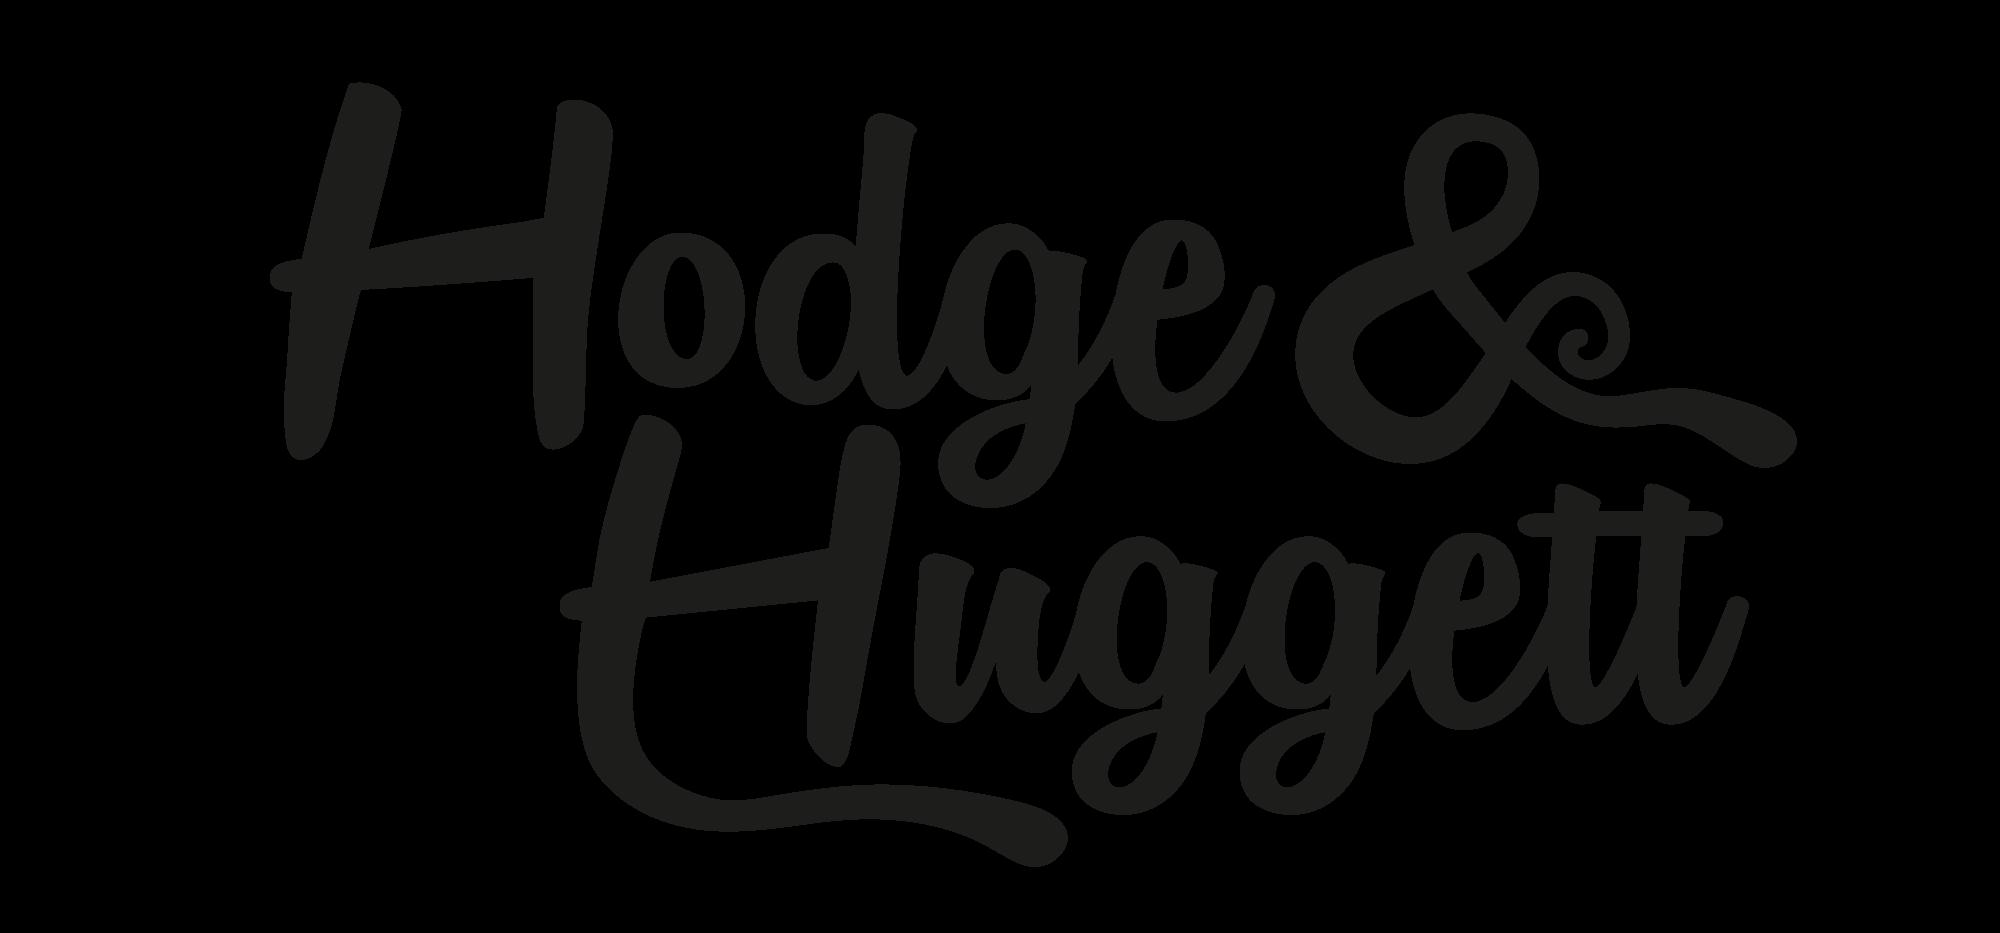 Hodge and Huggett